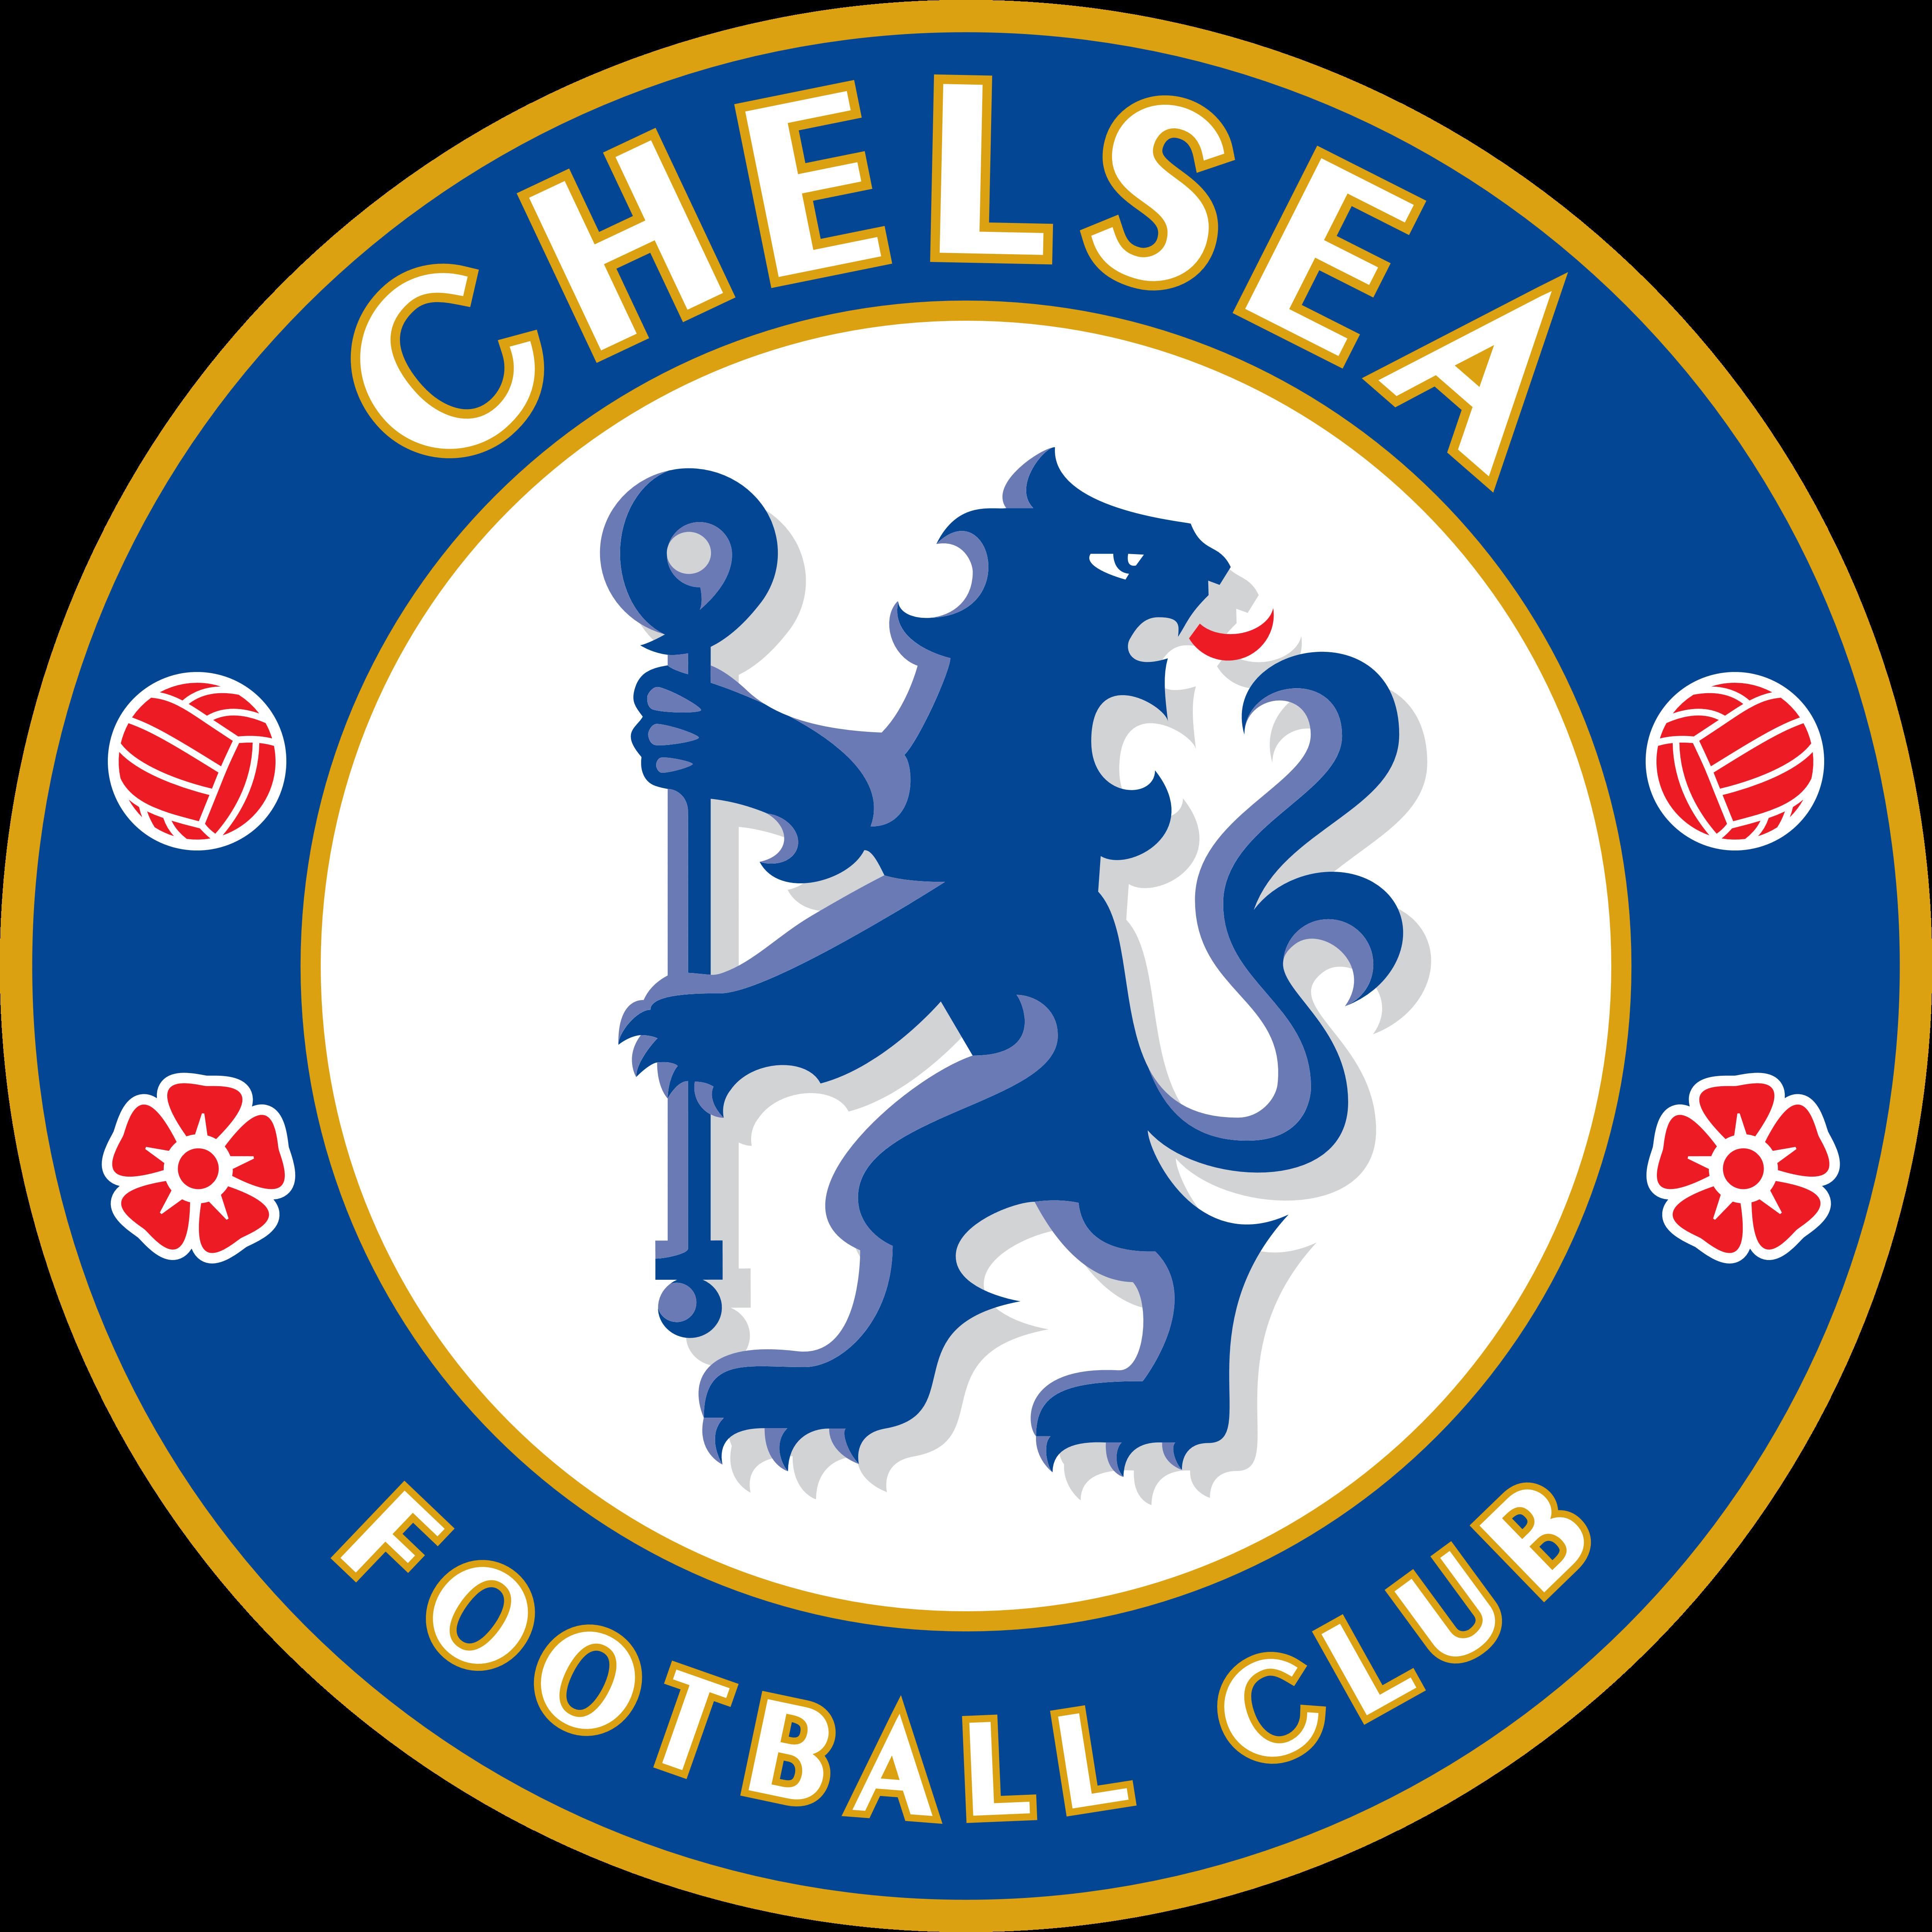 Chelsea Fc – Logos Download - Chelsea Logo PNG